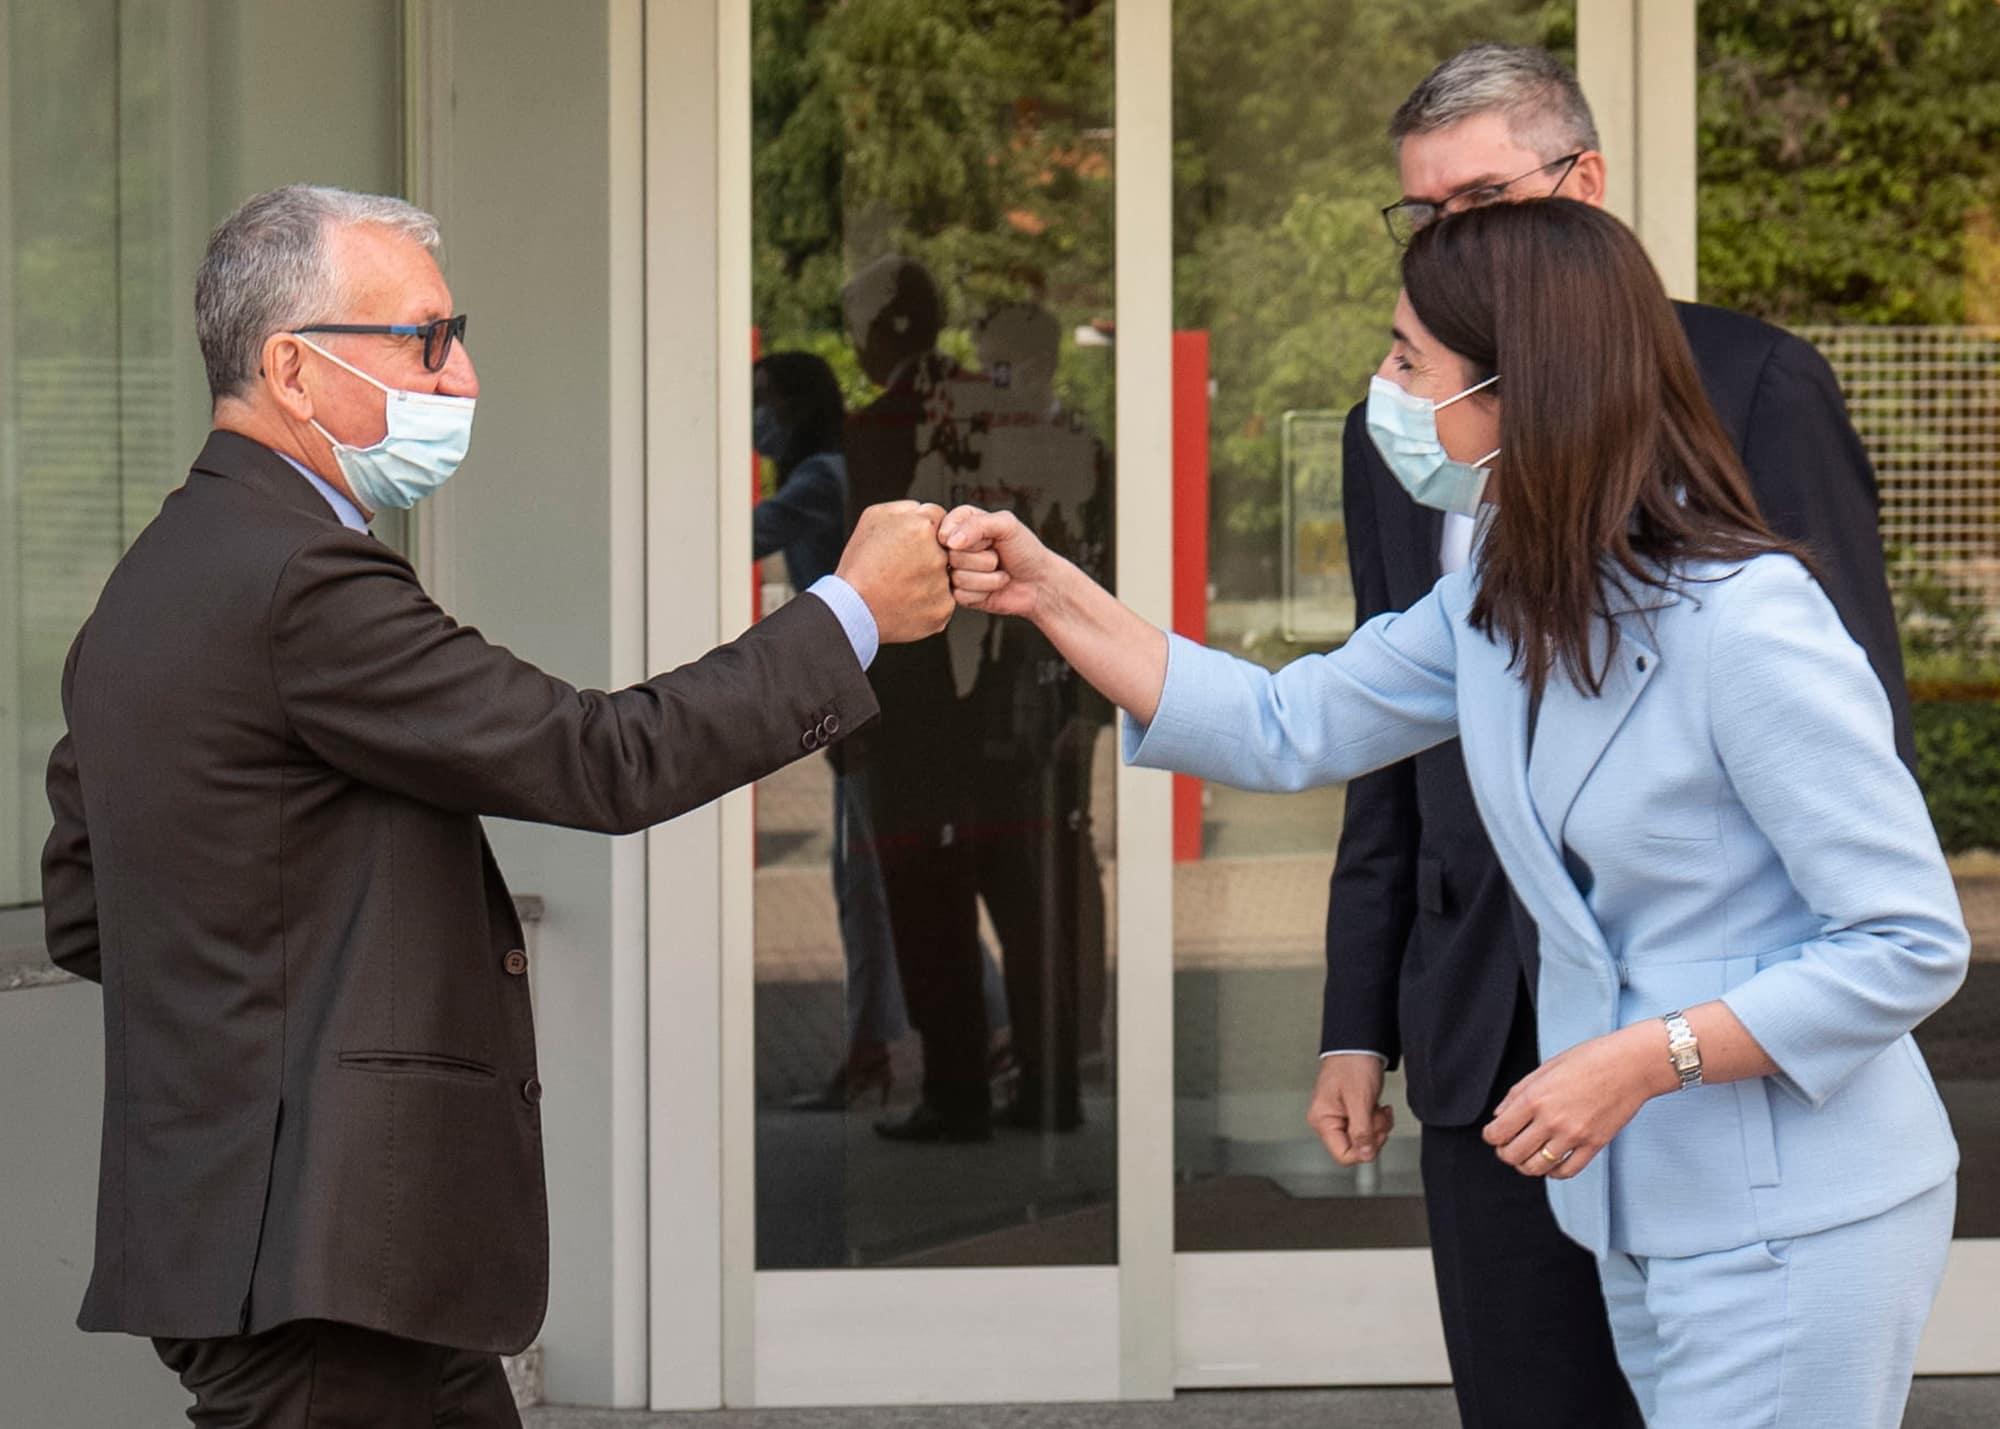 ELEMASTER WELCOME HIS EXCELLENCY, THE PREFECT OF LECCO DR. CASTRESE DE ROSA